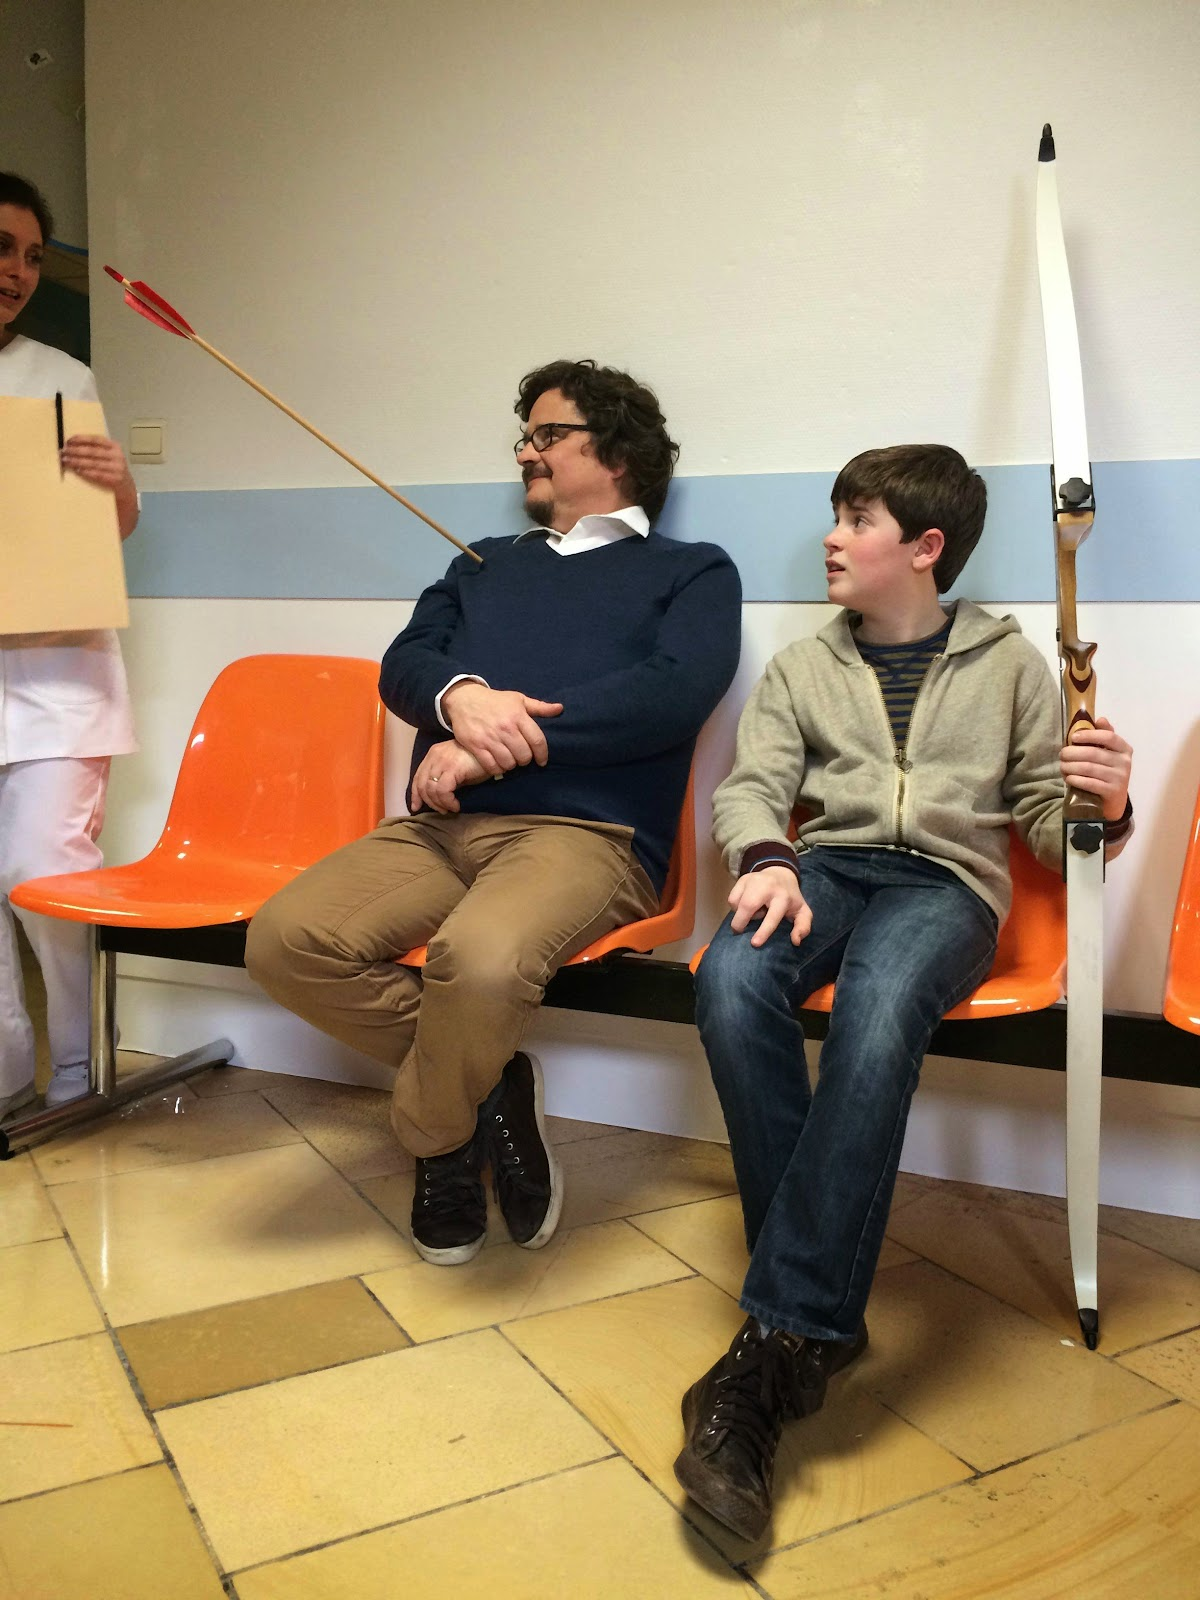 boy shoots arrow into fathers shoulder funny